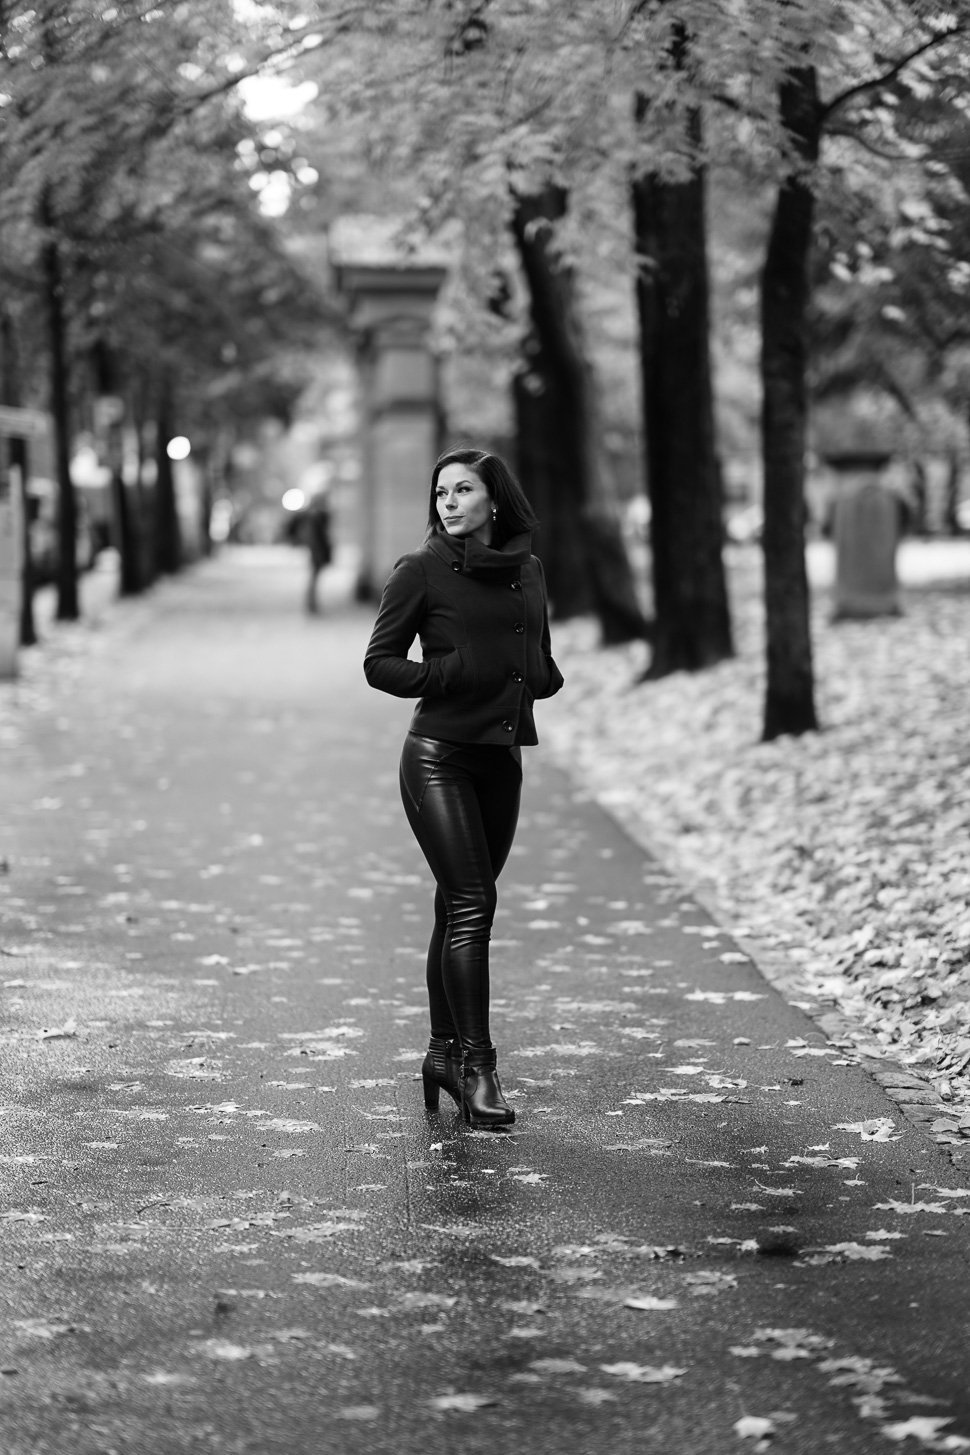 beautiful_black_and_white_portrait_photography_70.jpg